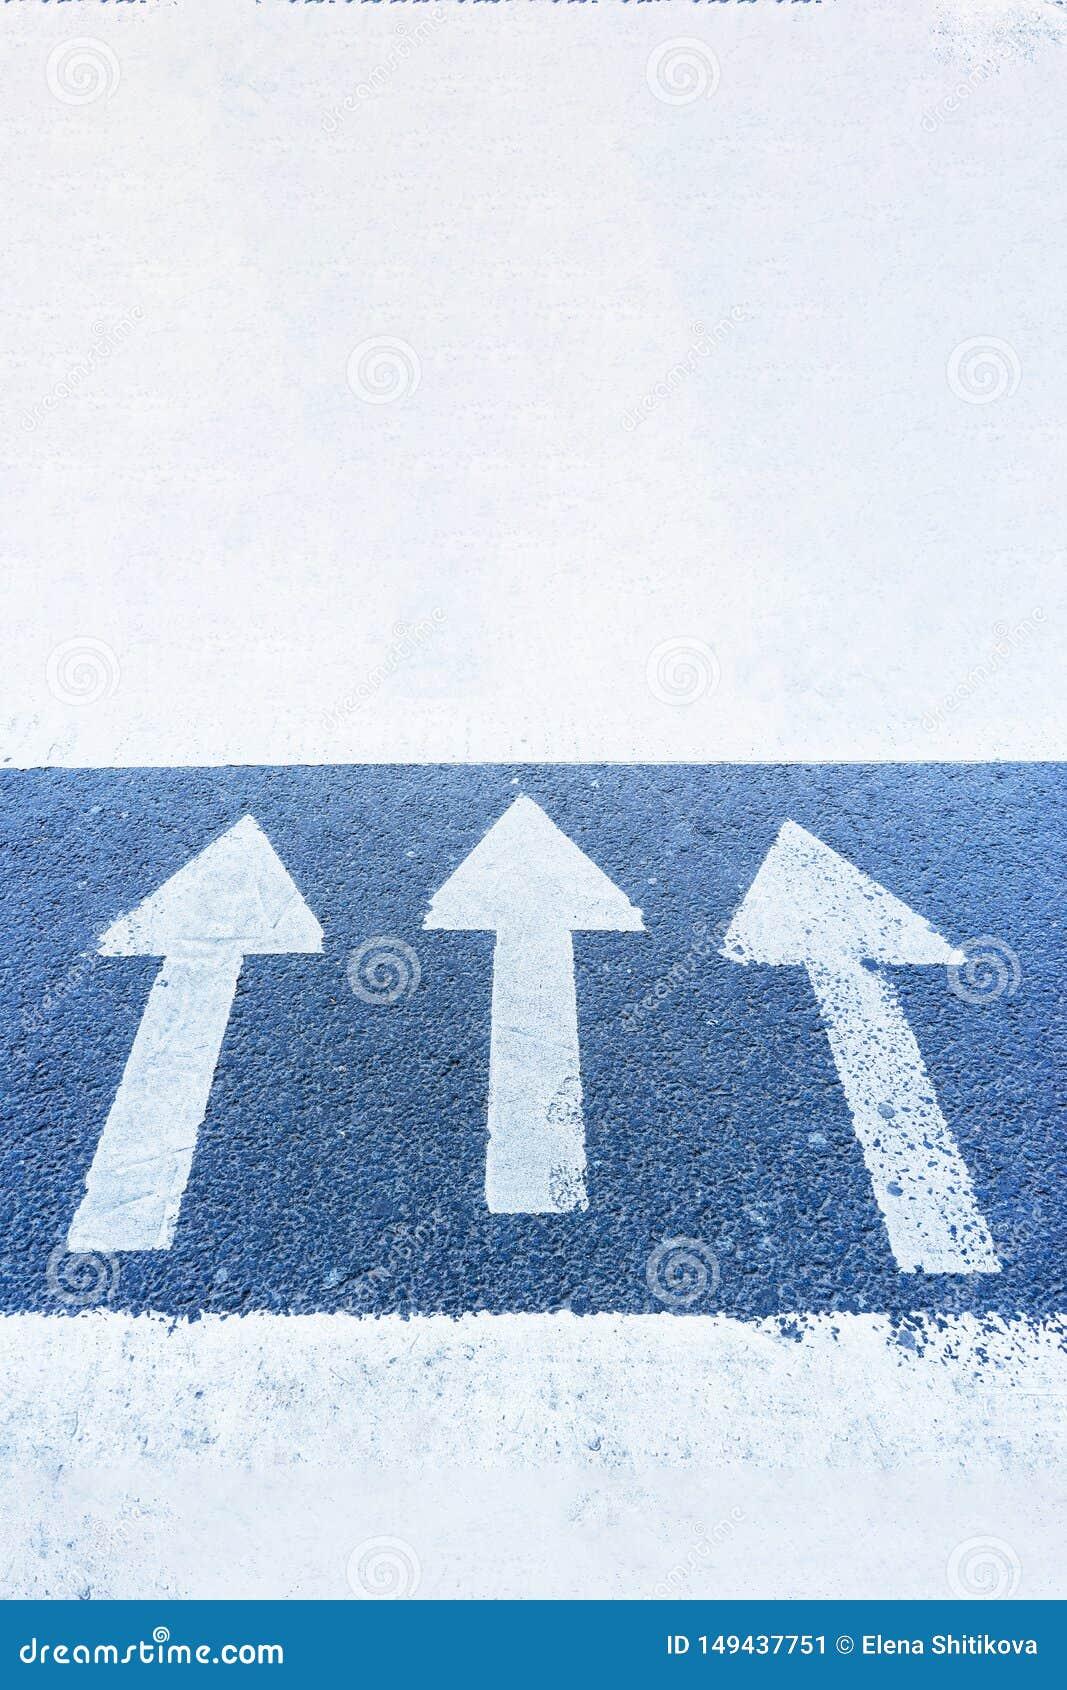 Three arrows on the blue surface of the asphalt point up, forward.